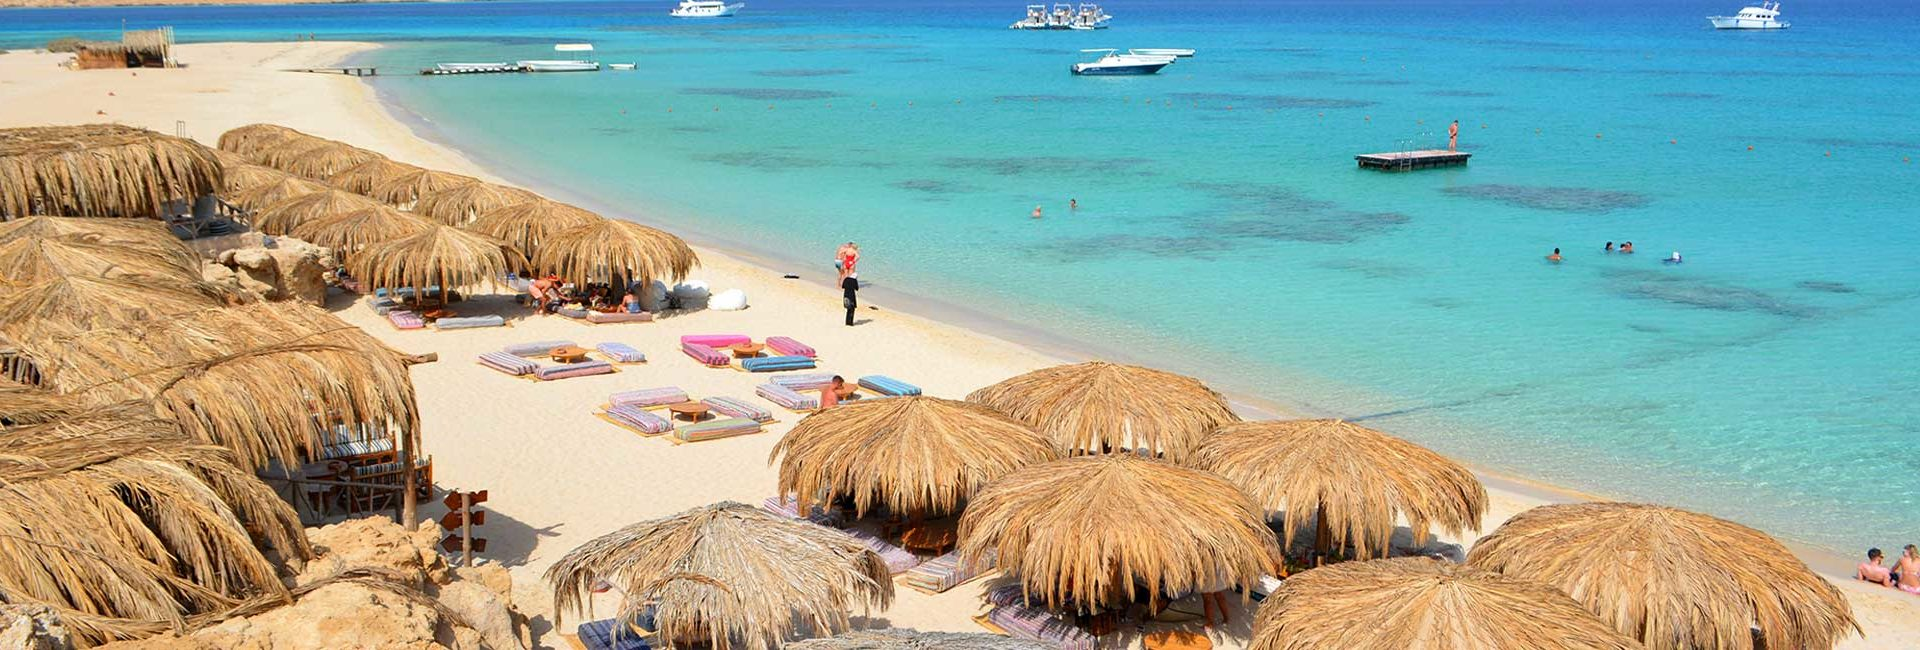 Hurghada Shore Excursions